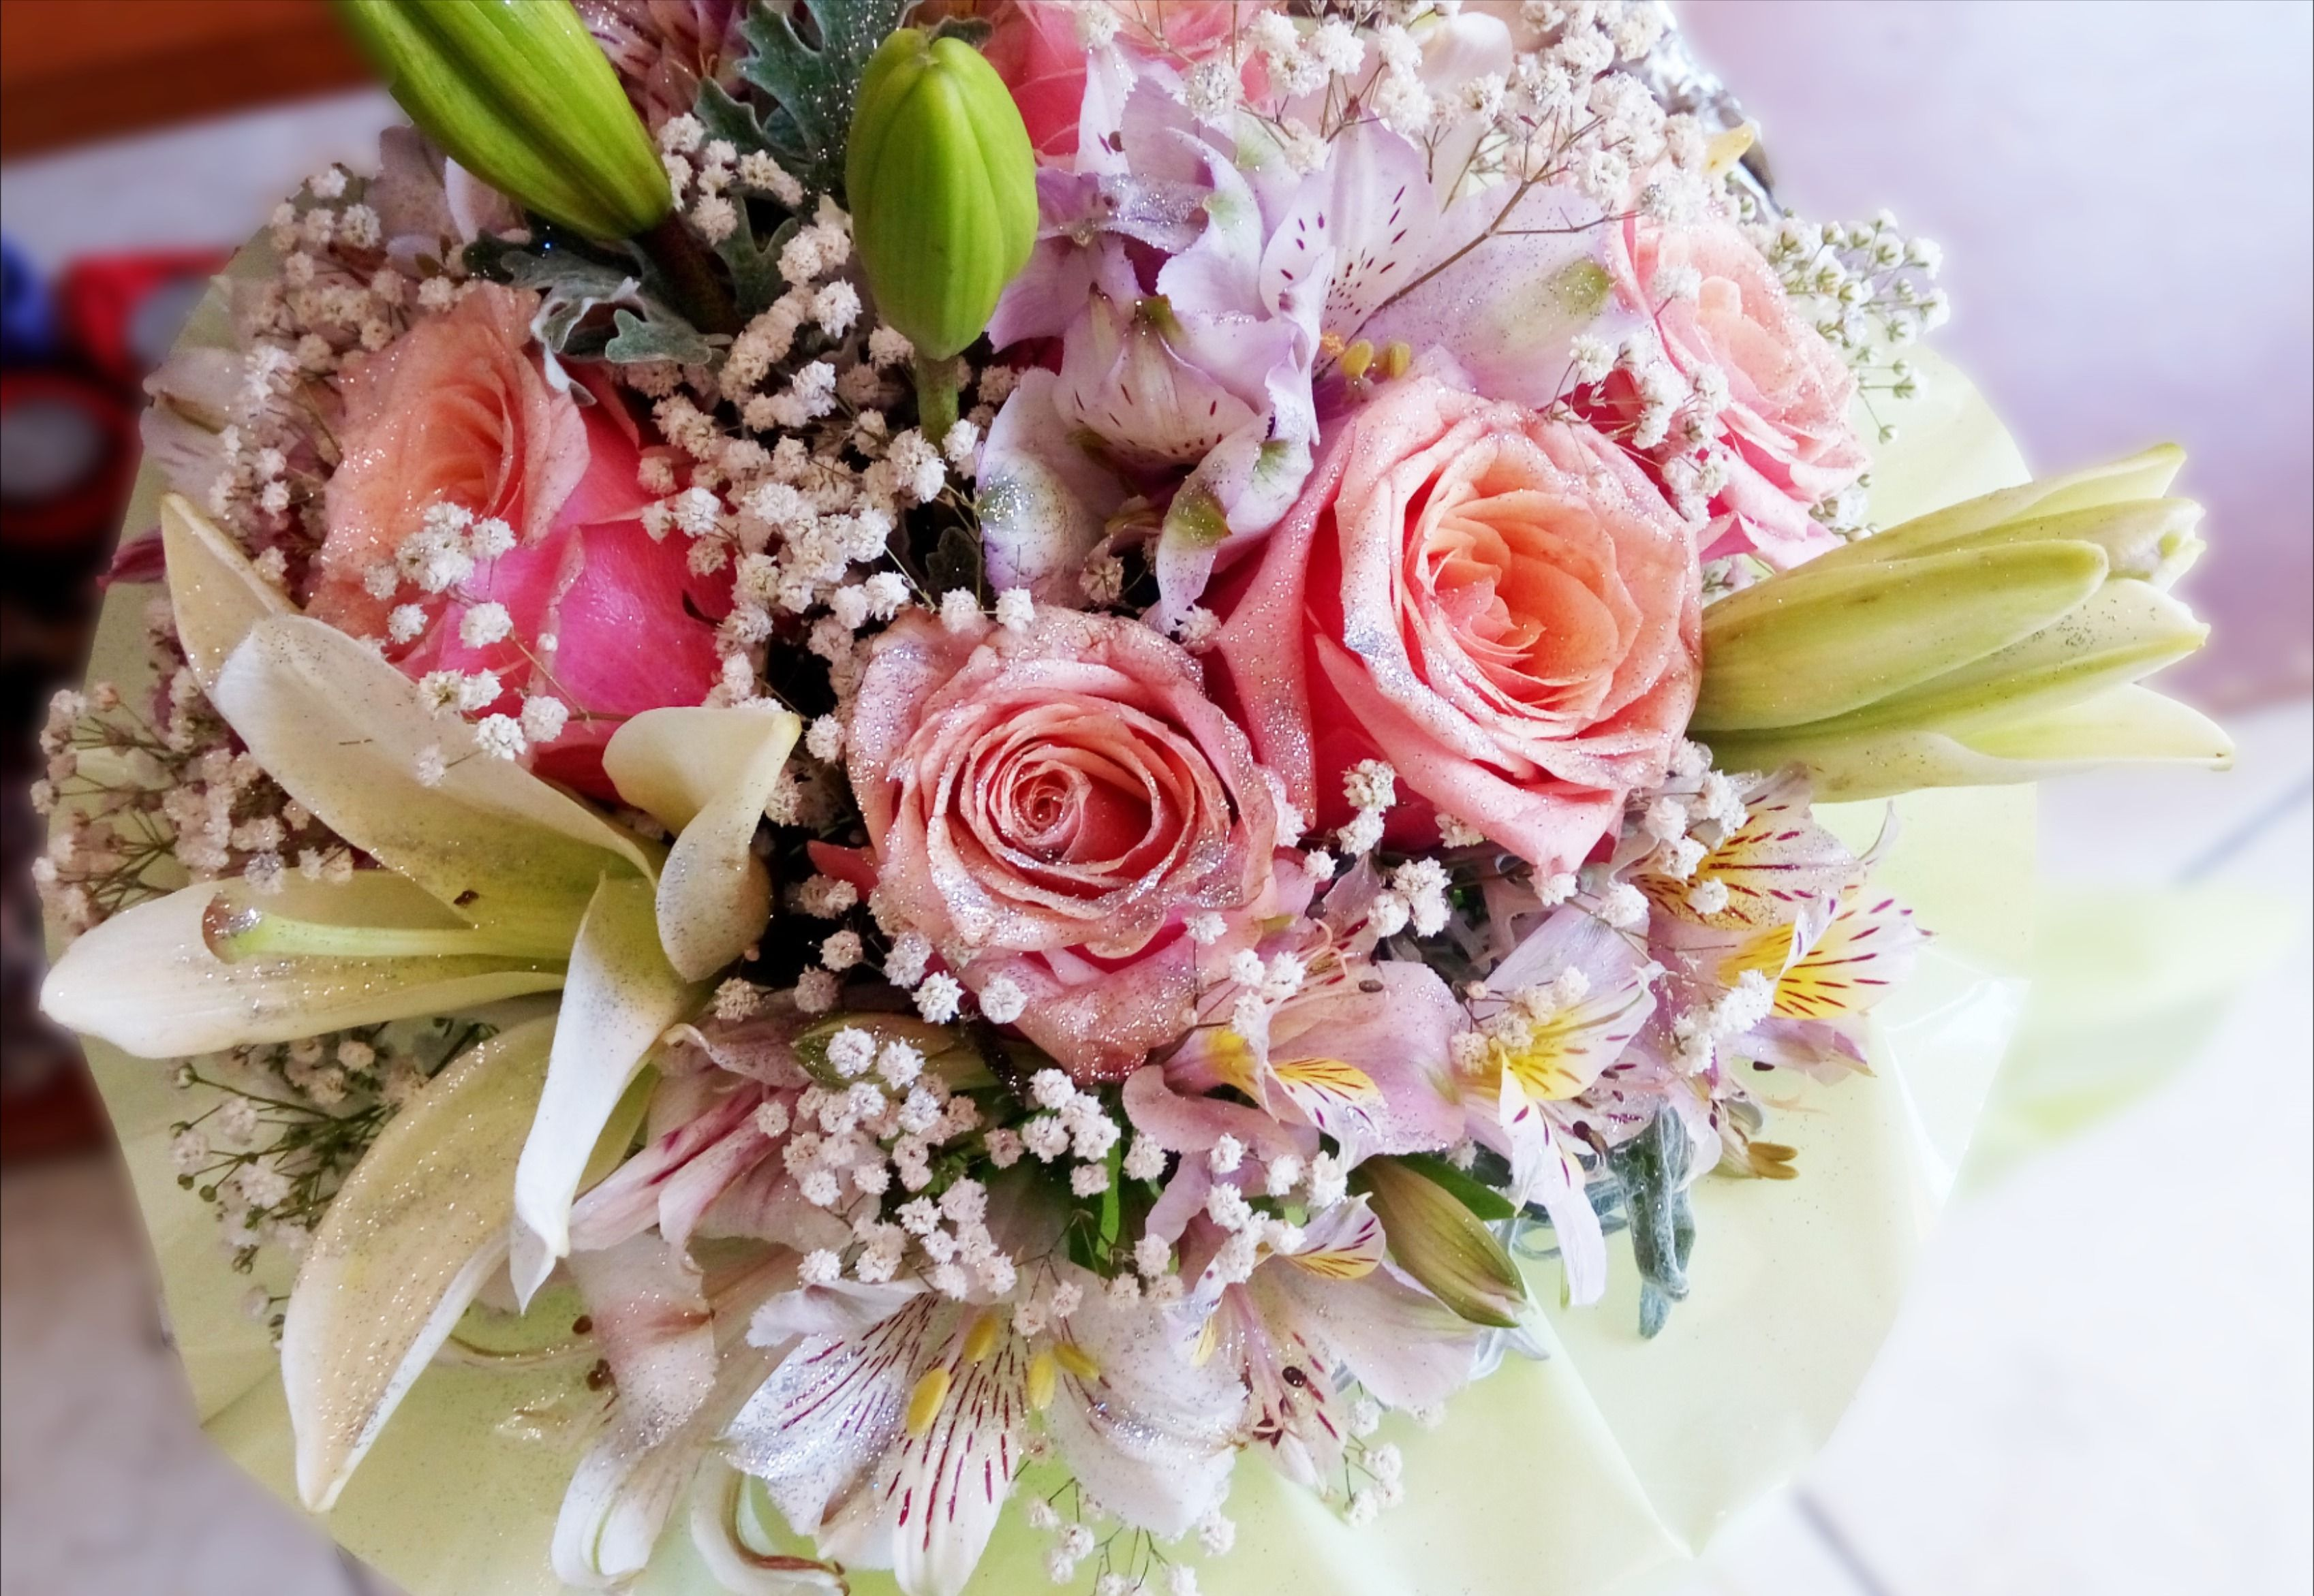 Flowers don't tell. They show.🌸💕 #cvjecarnicasplit #dostavacvijeca #besplatnadostava #cvijecesplit #flowershop #floristic #floweraddict #flowerartist#flowerstagram #instaflower #instaflorist #decoration #love #buquet#poklon